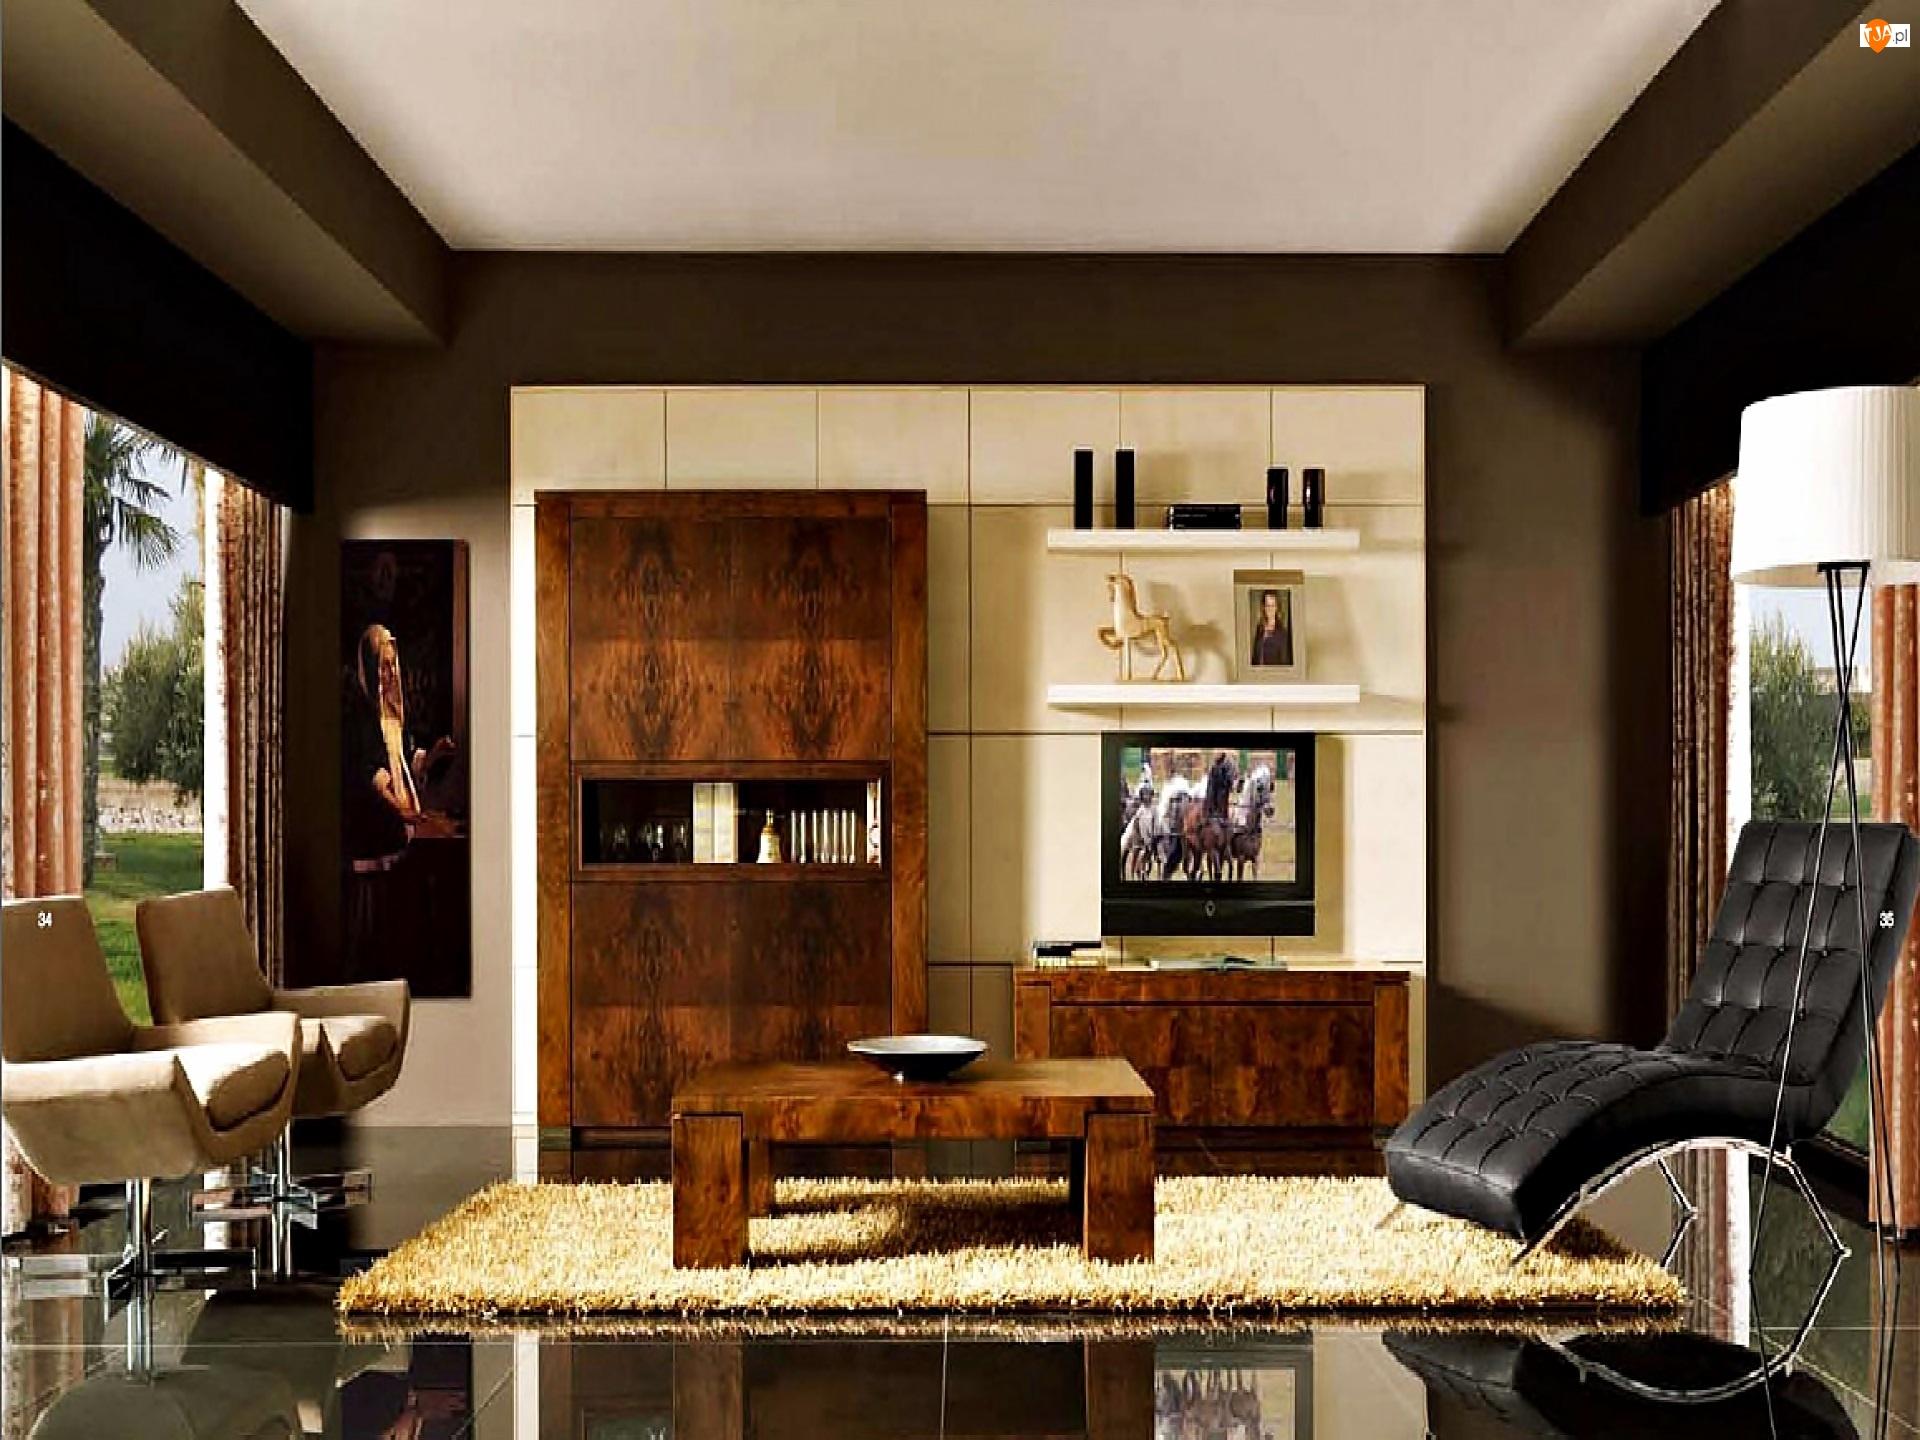 Telewizor, Pokój, Fotele